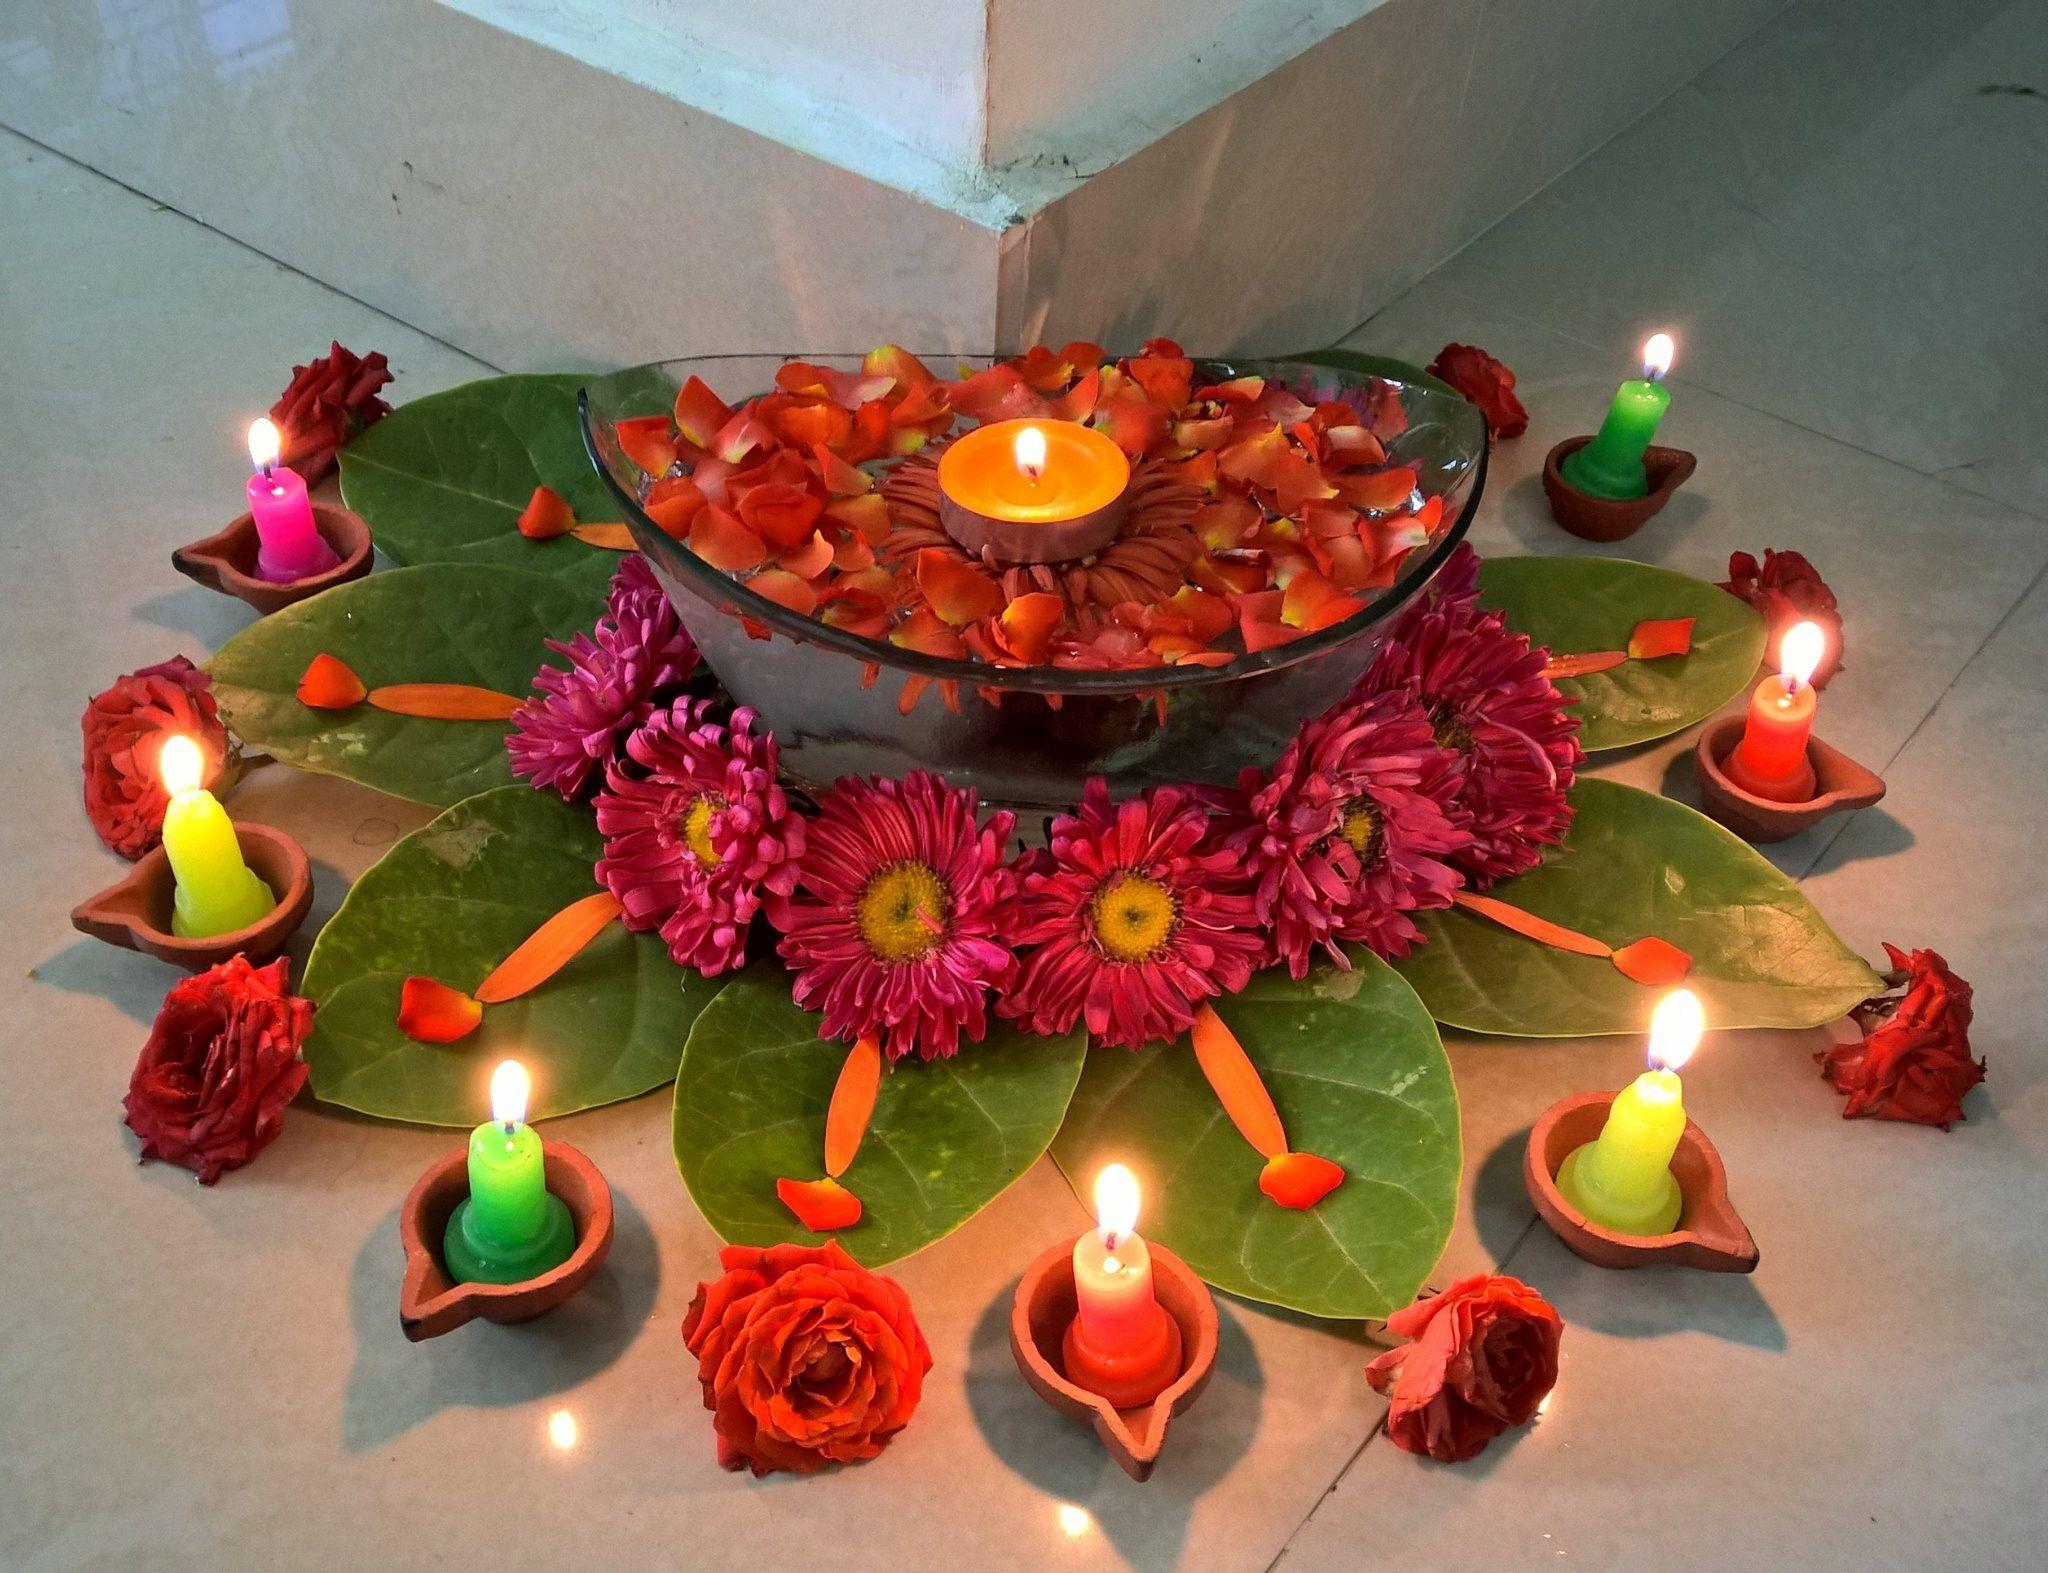 Flower Arrangement For Diwali Festival Diwali Decorations At Home Flower Decorations Diy Diwali Decorations